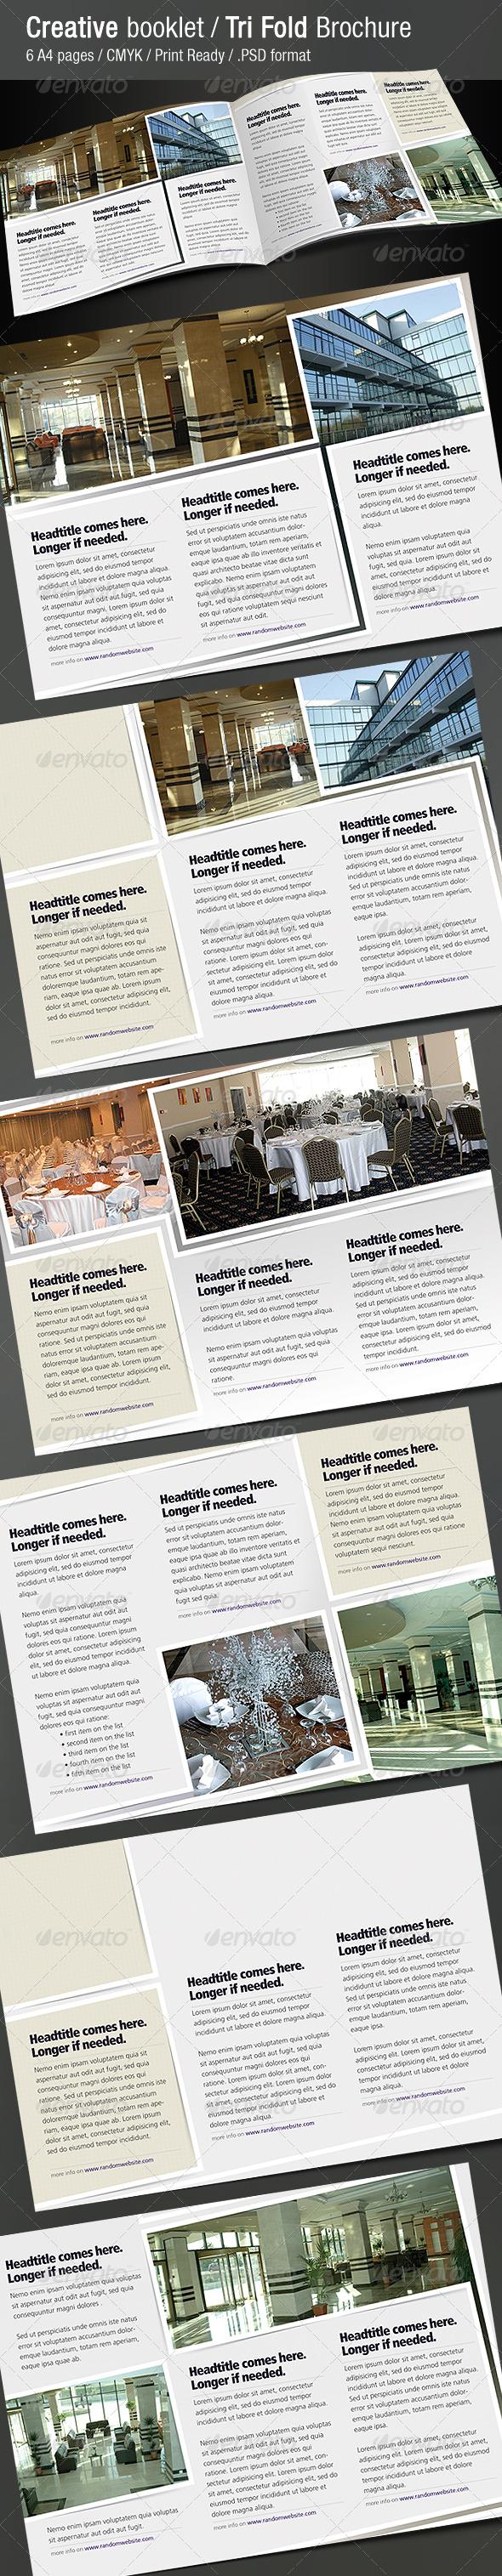 Graphic River Creative Booklet / Tri Fold Brochure Print Templates -  Brochures  Corporate 242346